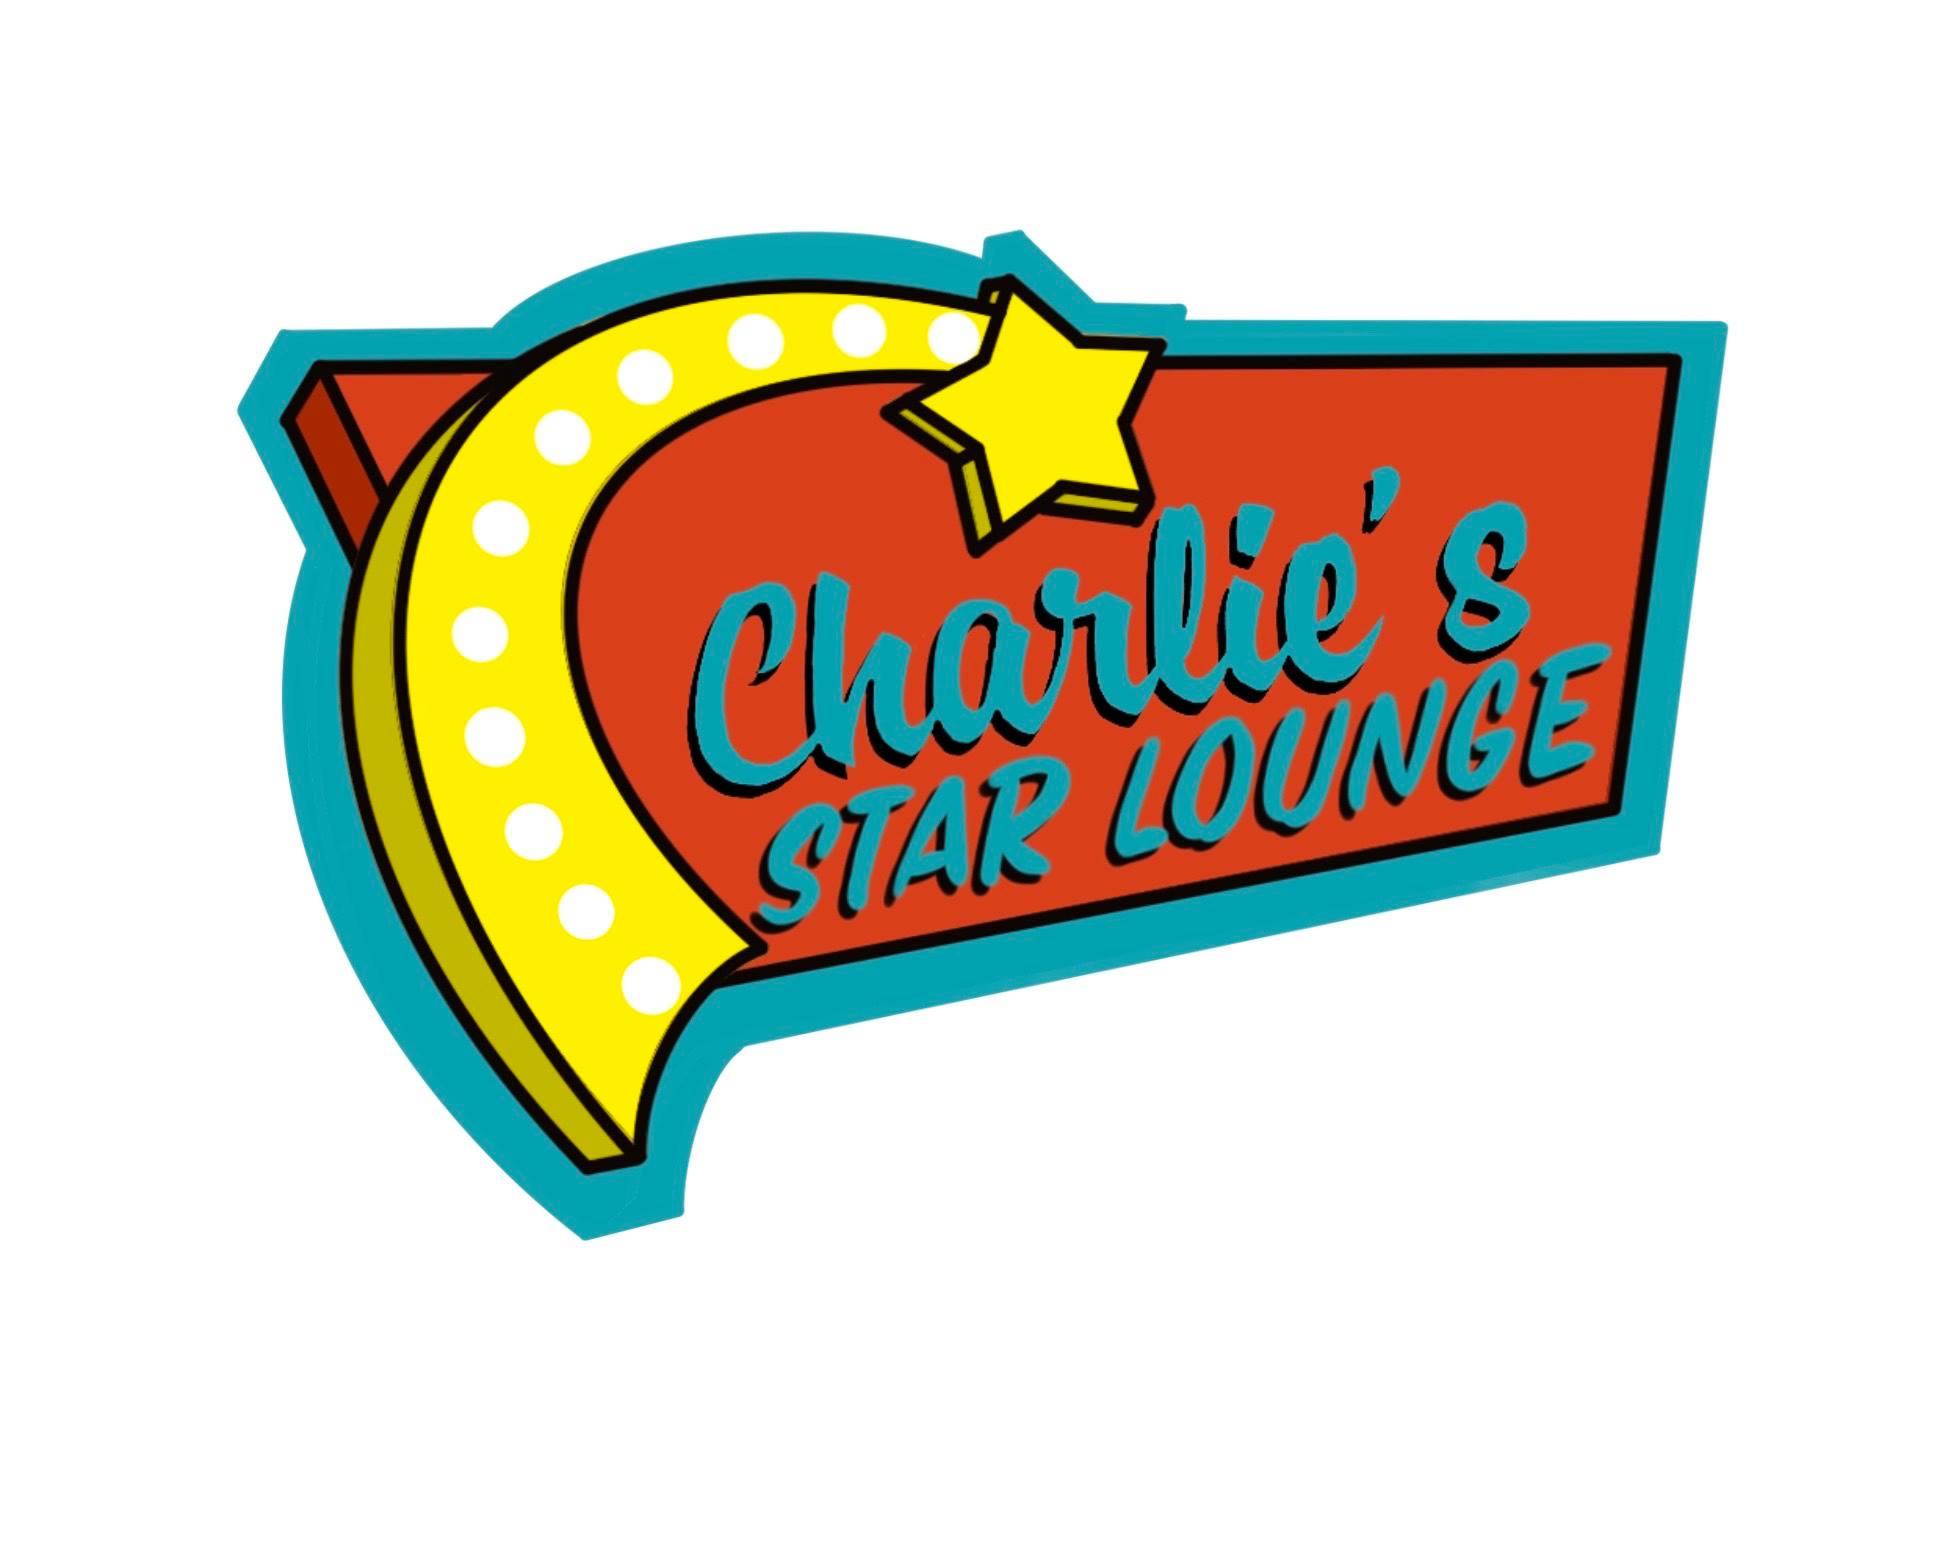 Charlie's Star Lounge